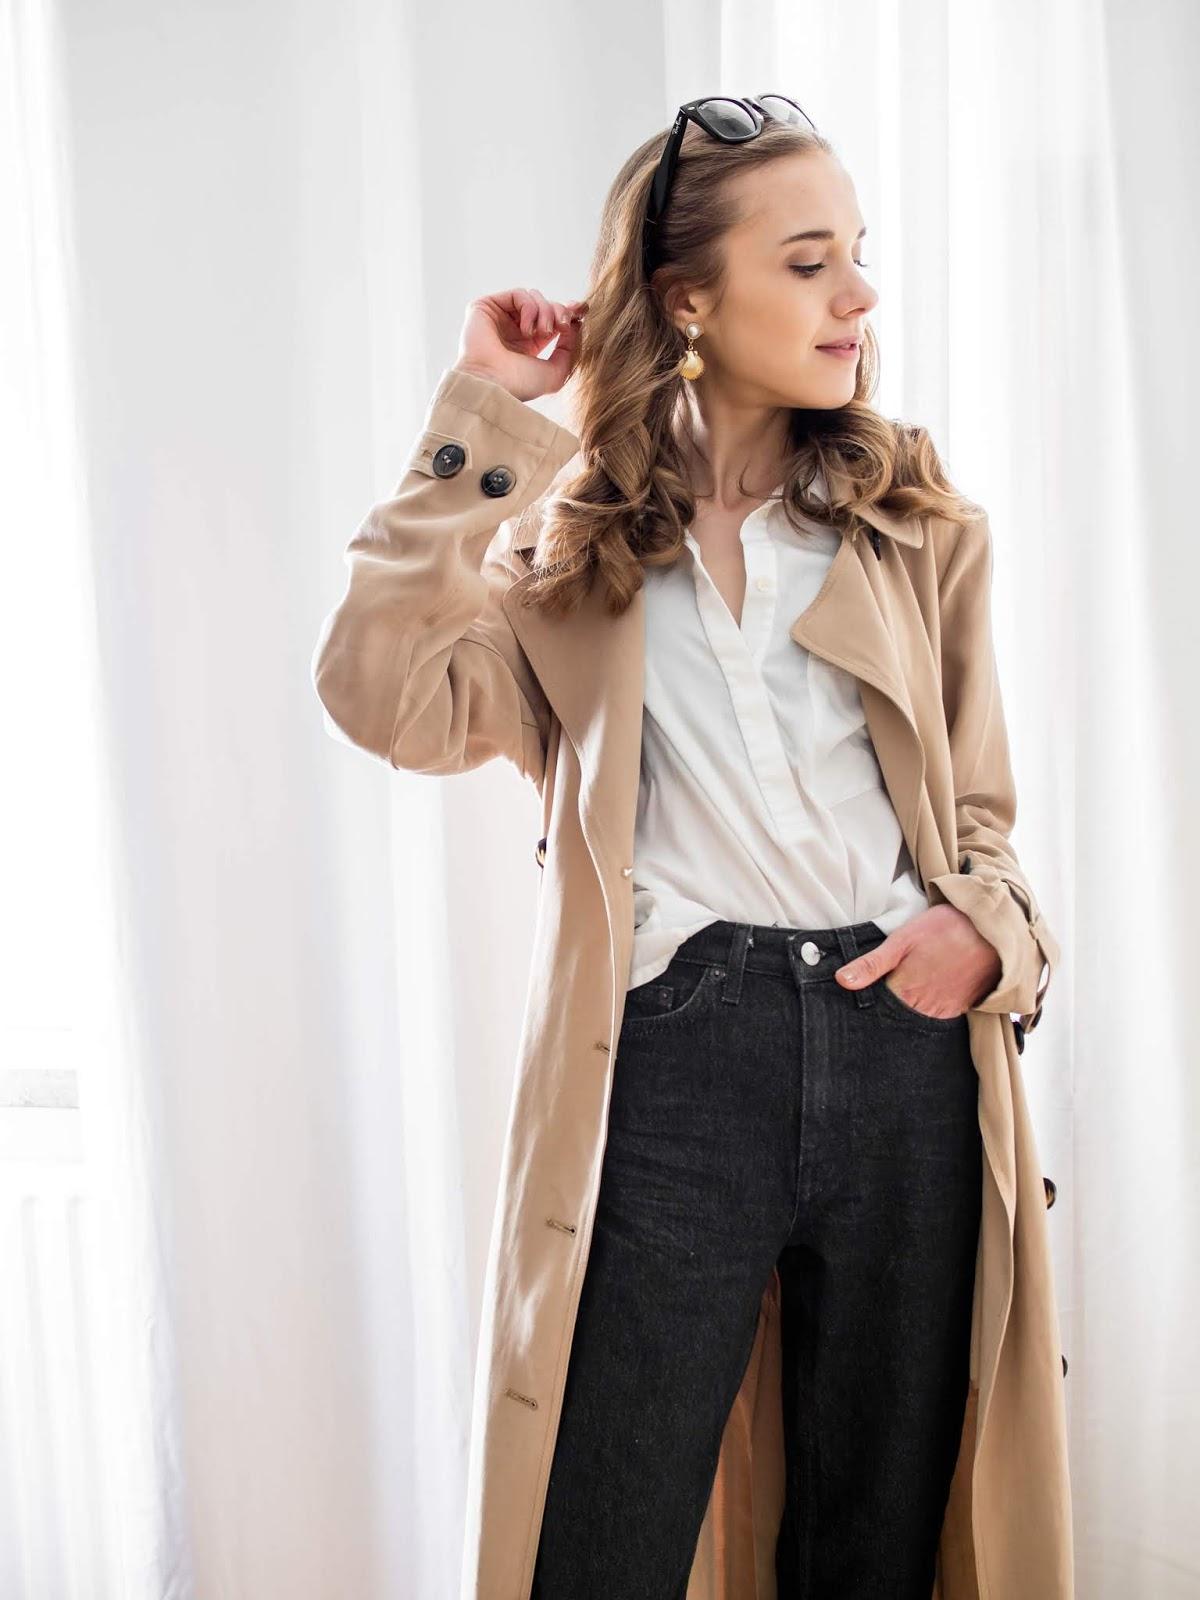 Spring outfit with long trench coat - Kevätasu pitkän trenssitakin kanssa